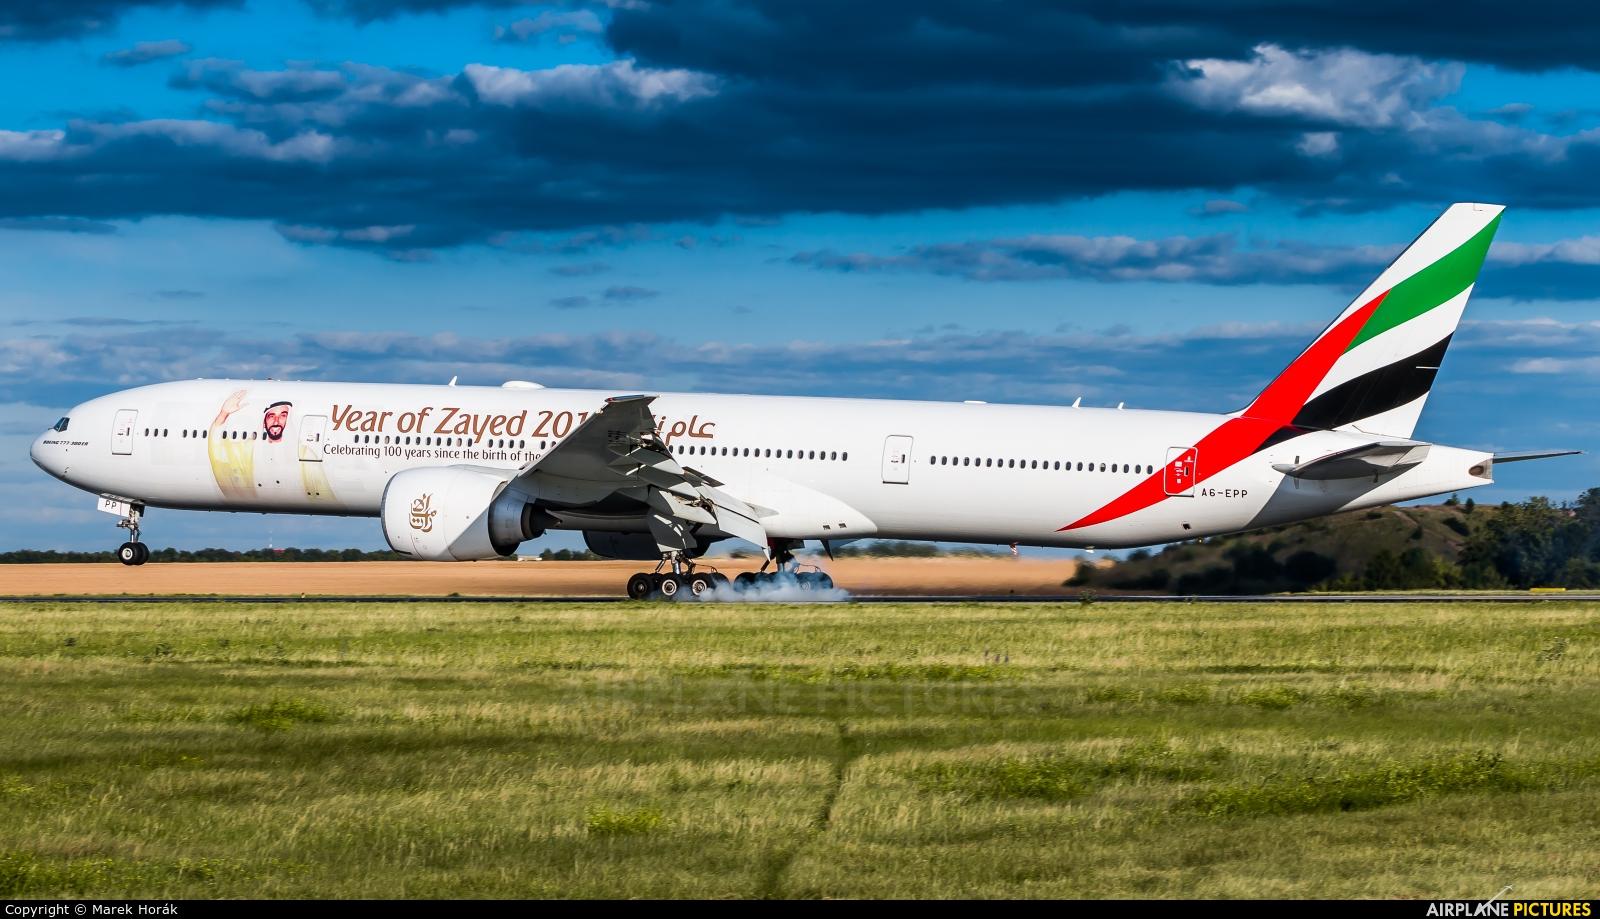 Emirates Airlines A6-EPP aircraft at Prague - Václav Havel